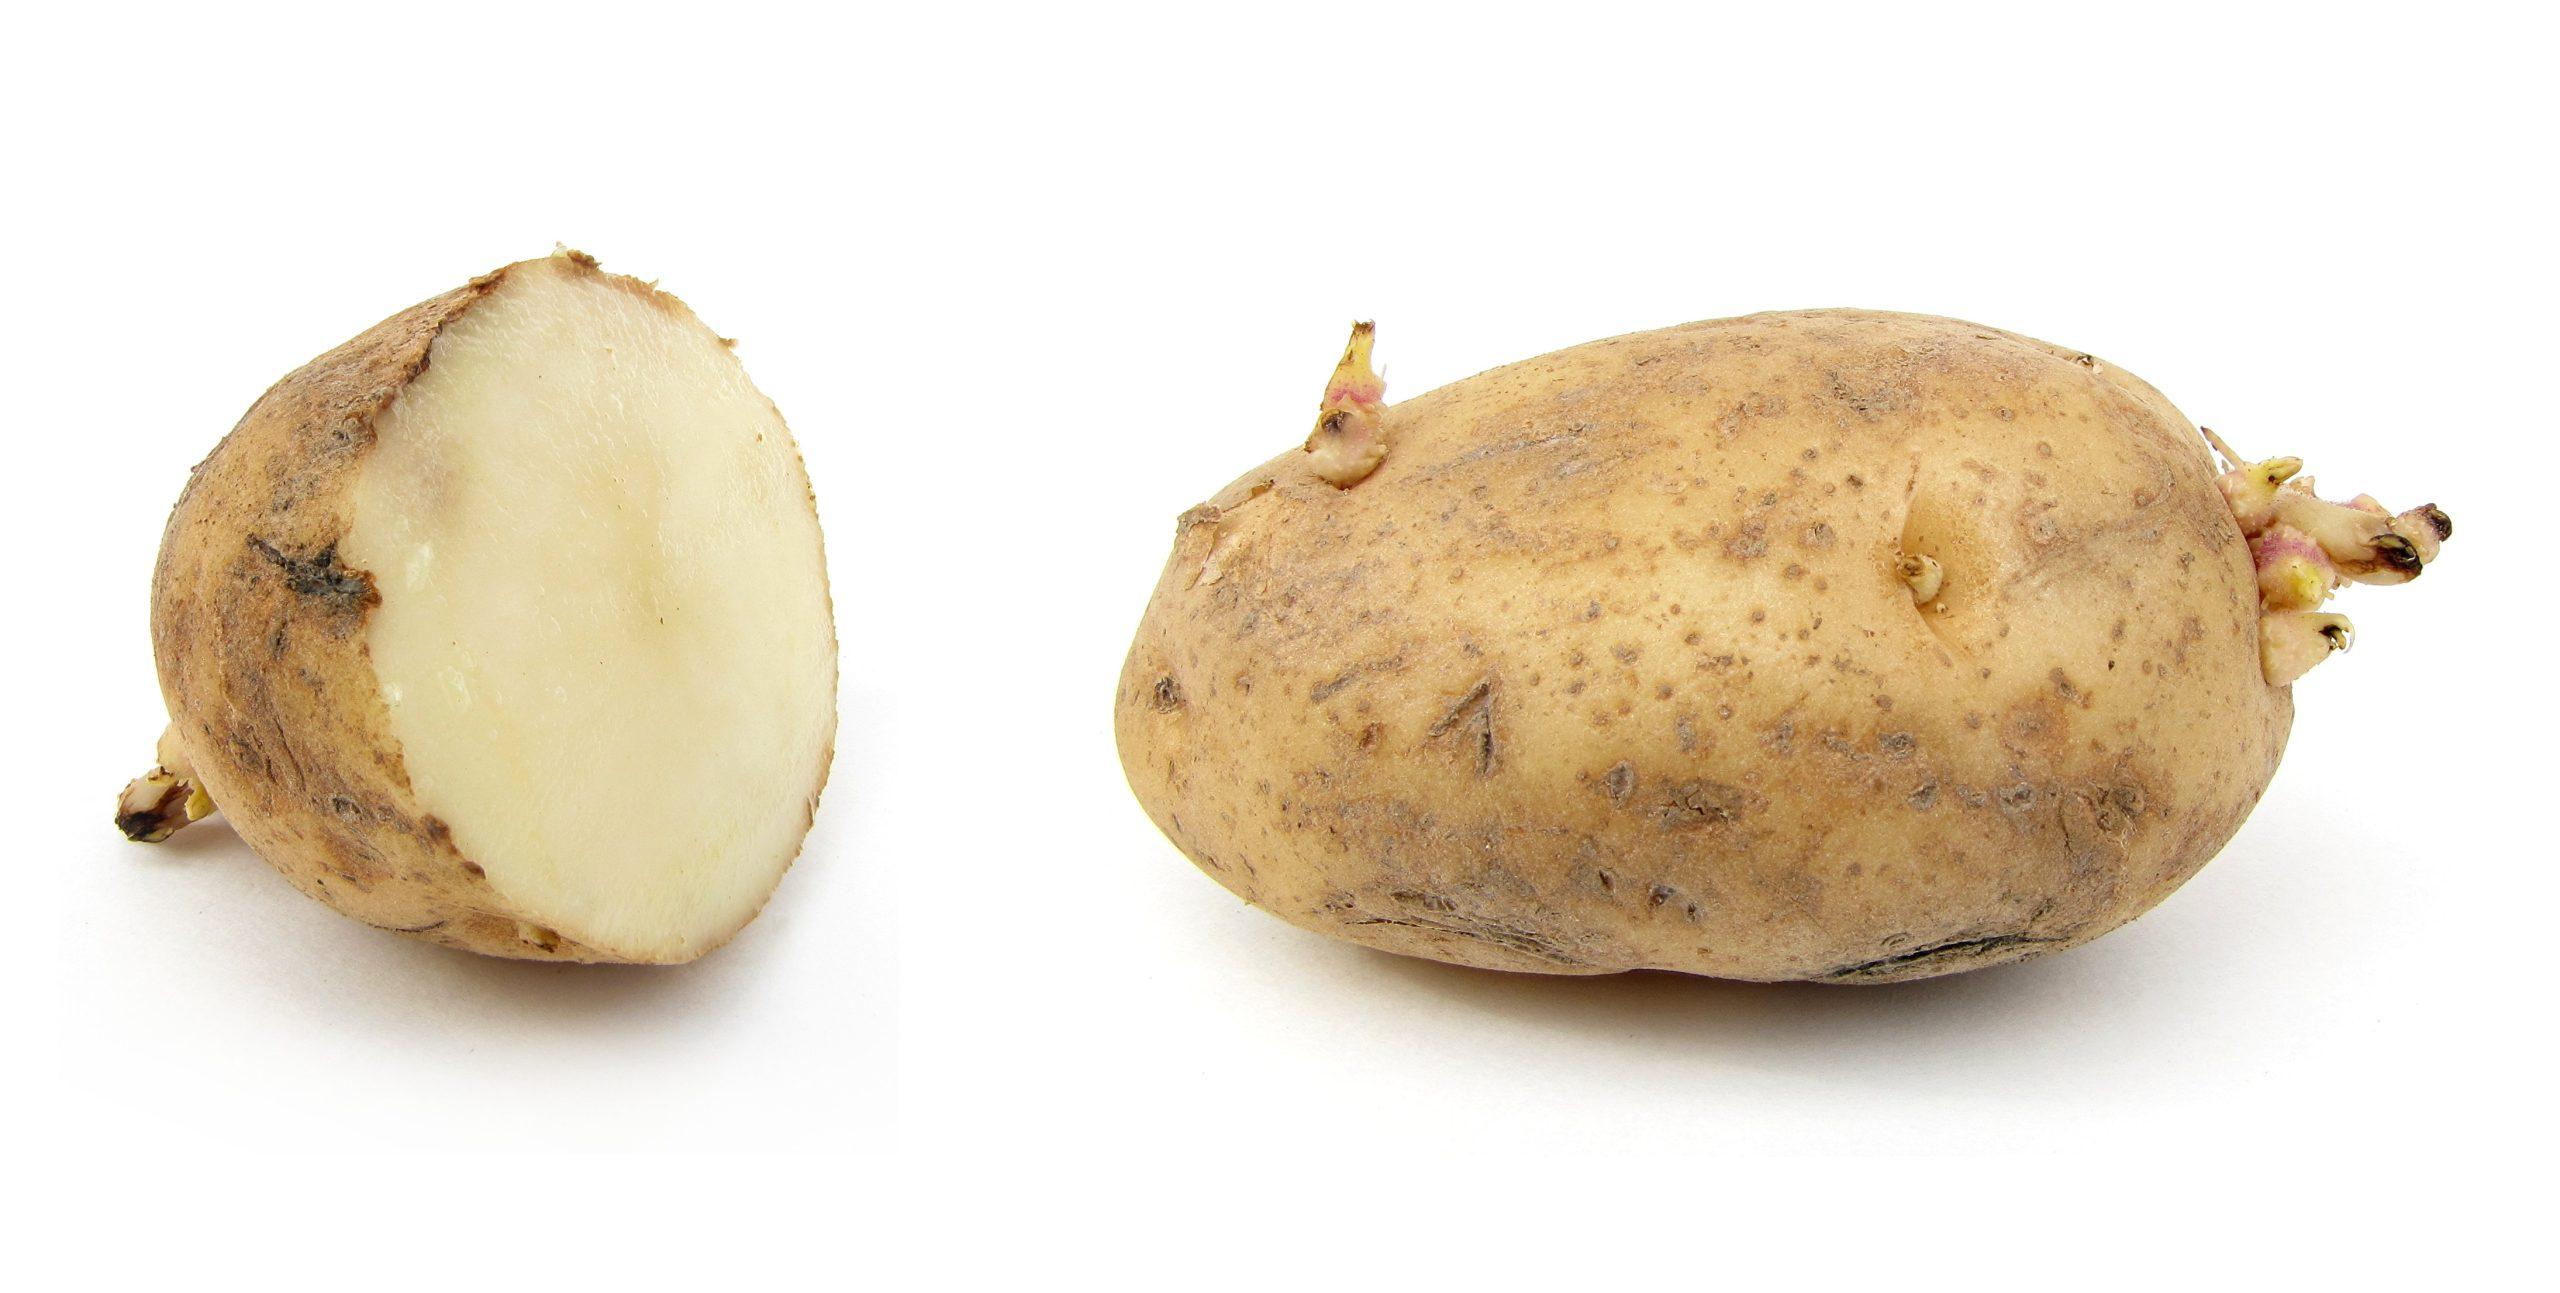 krumpis